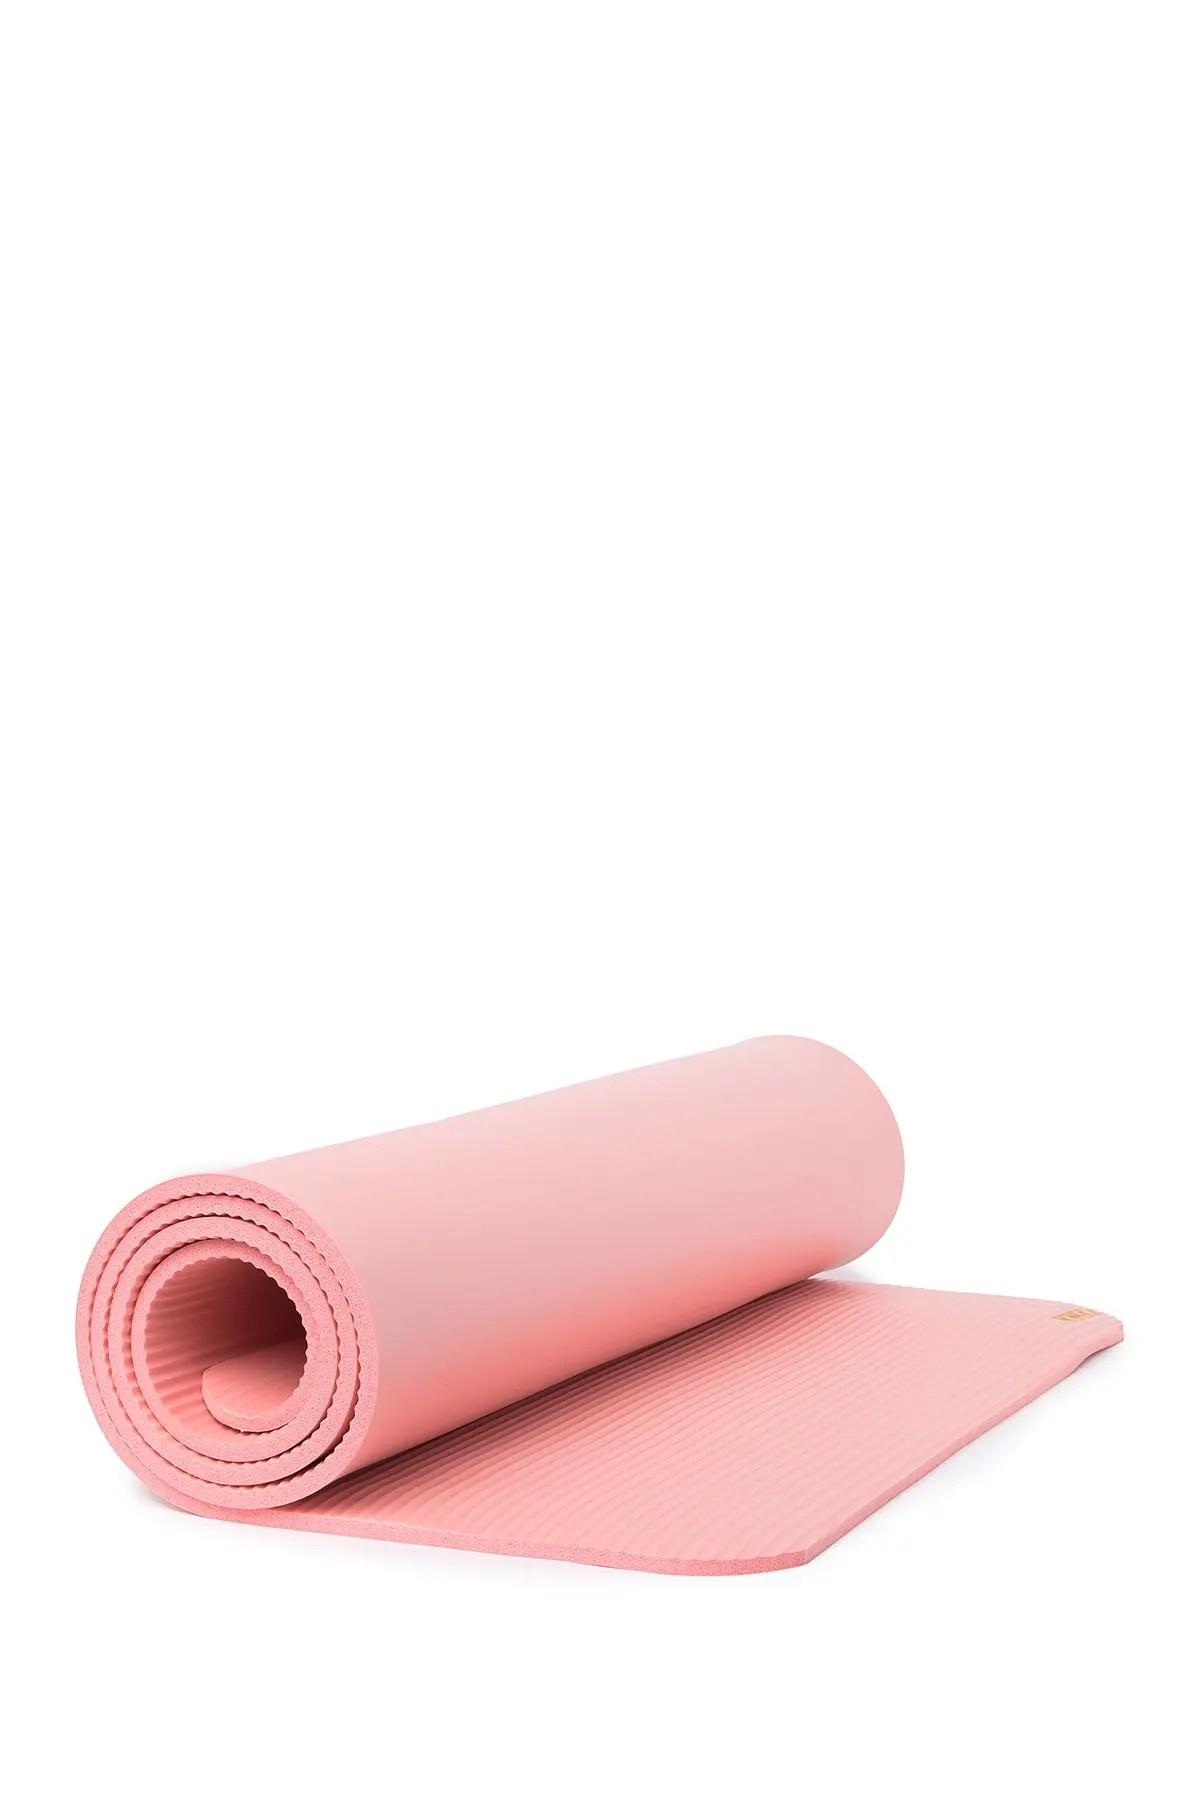 tko 10mm exercise mat w sling pink nordstrom rack